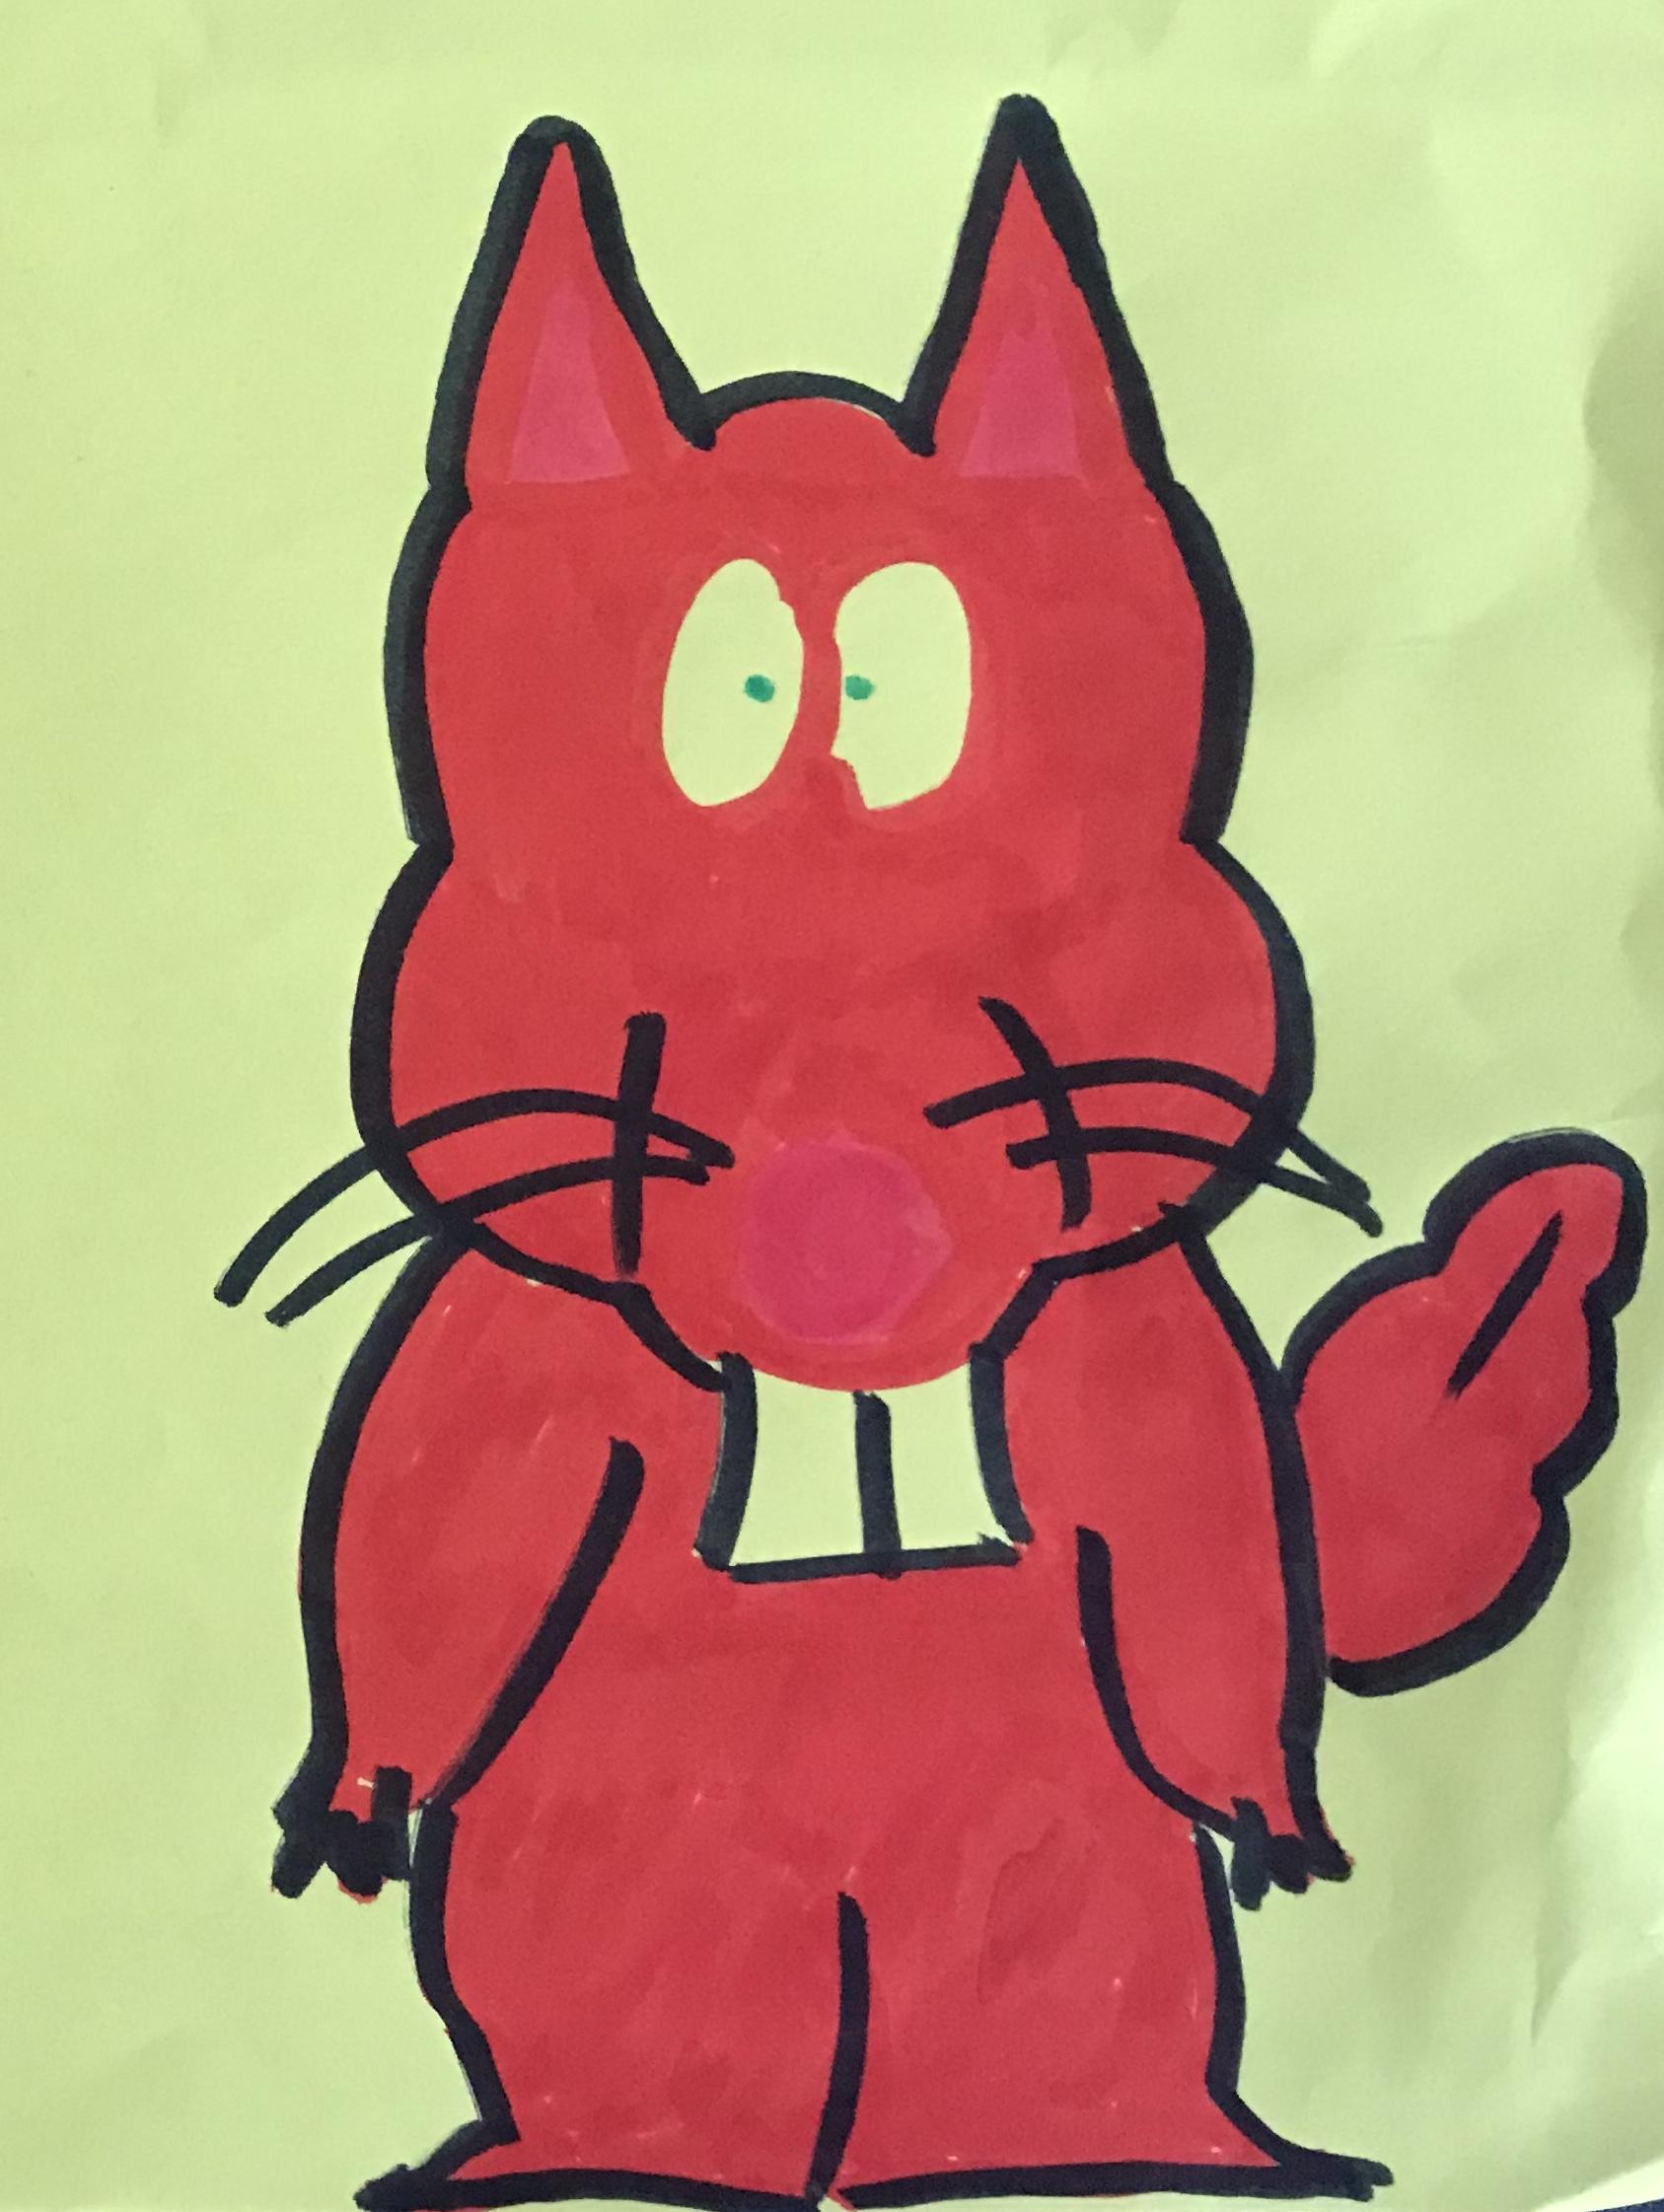 Where are my nuts squirrel drawing artwork art marker sketch cartoon comic kawaii cute